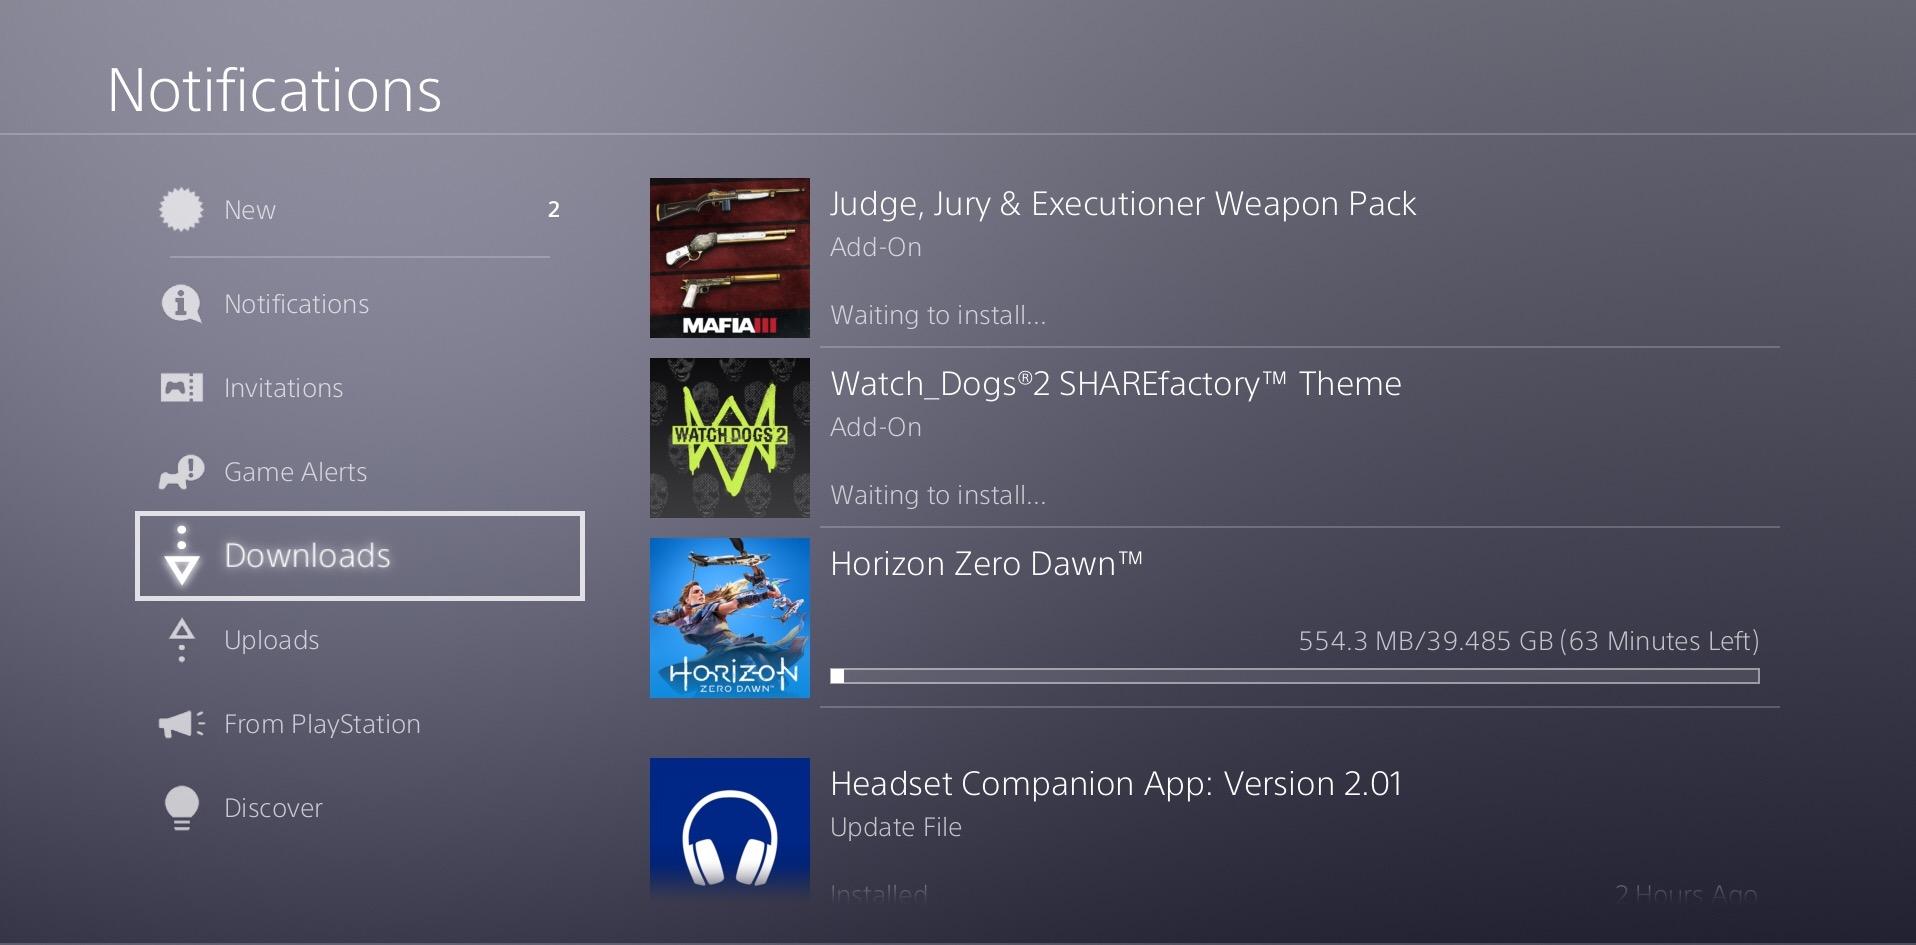 horizon_zero_dawn_download_size_1